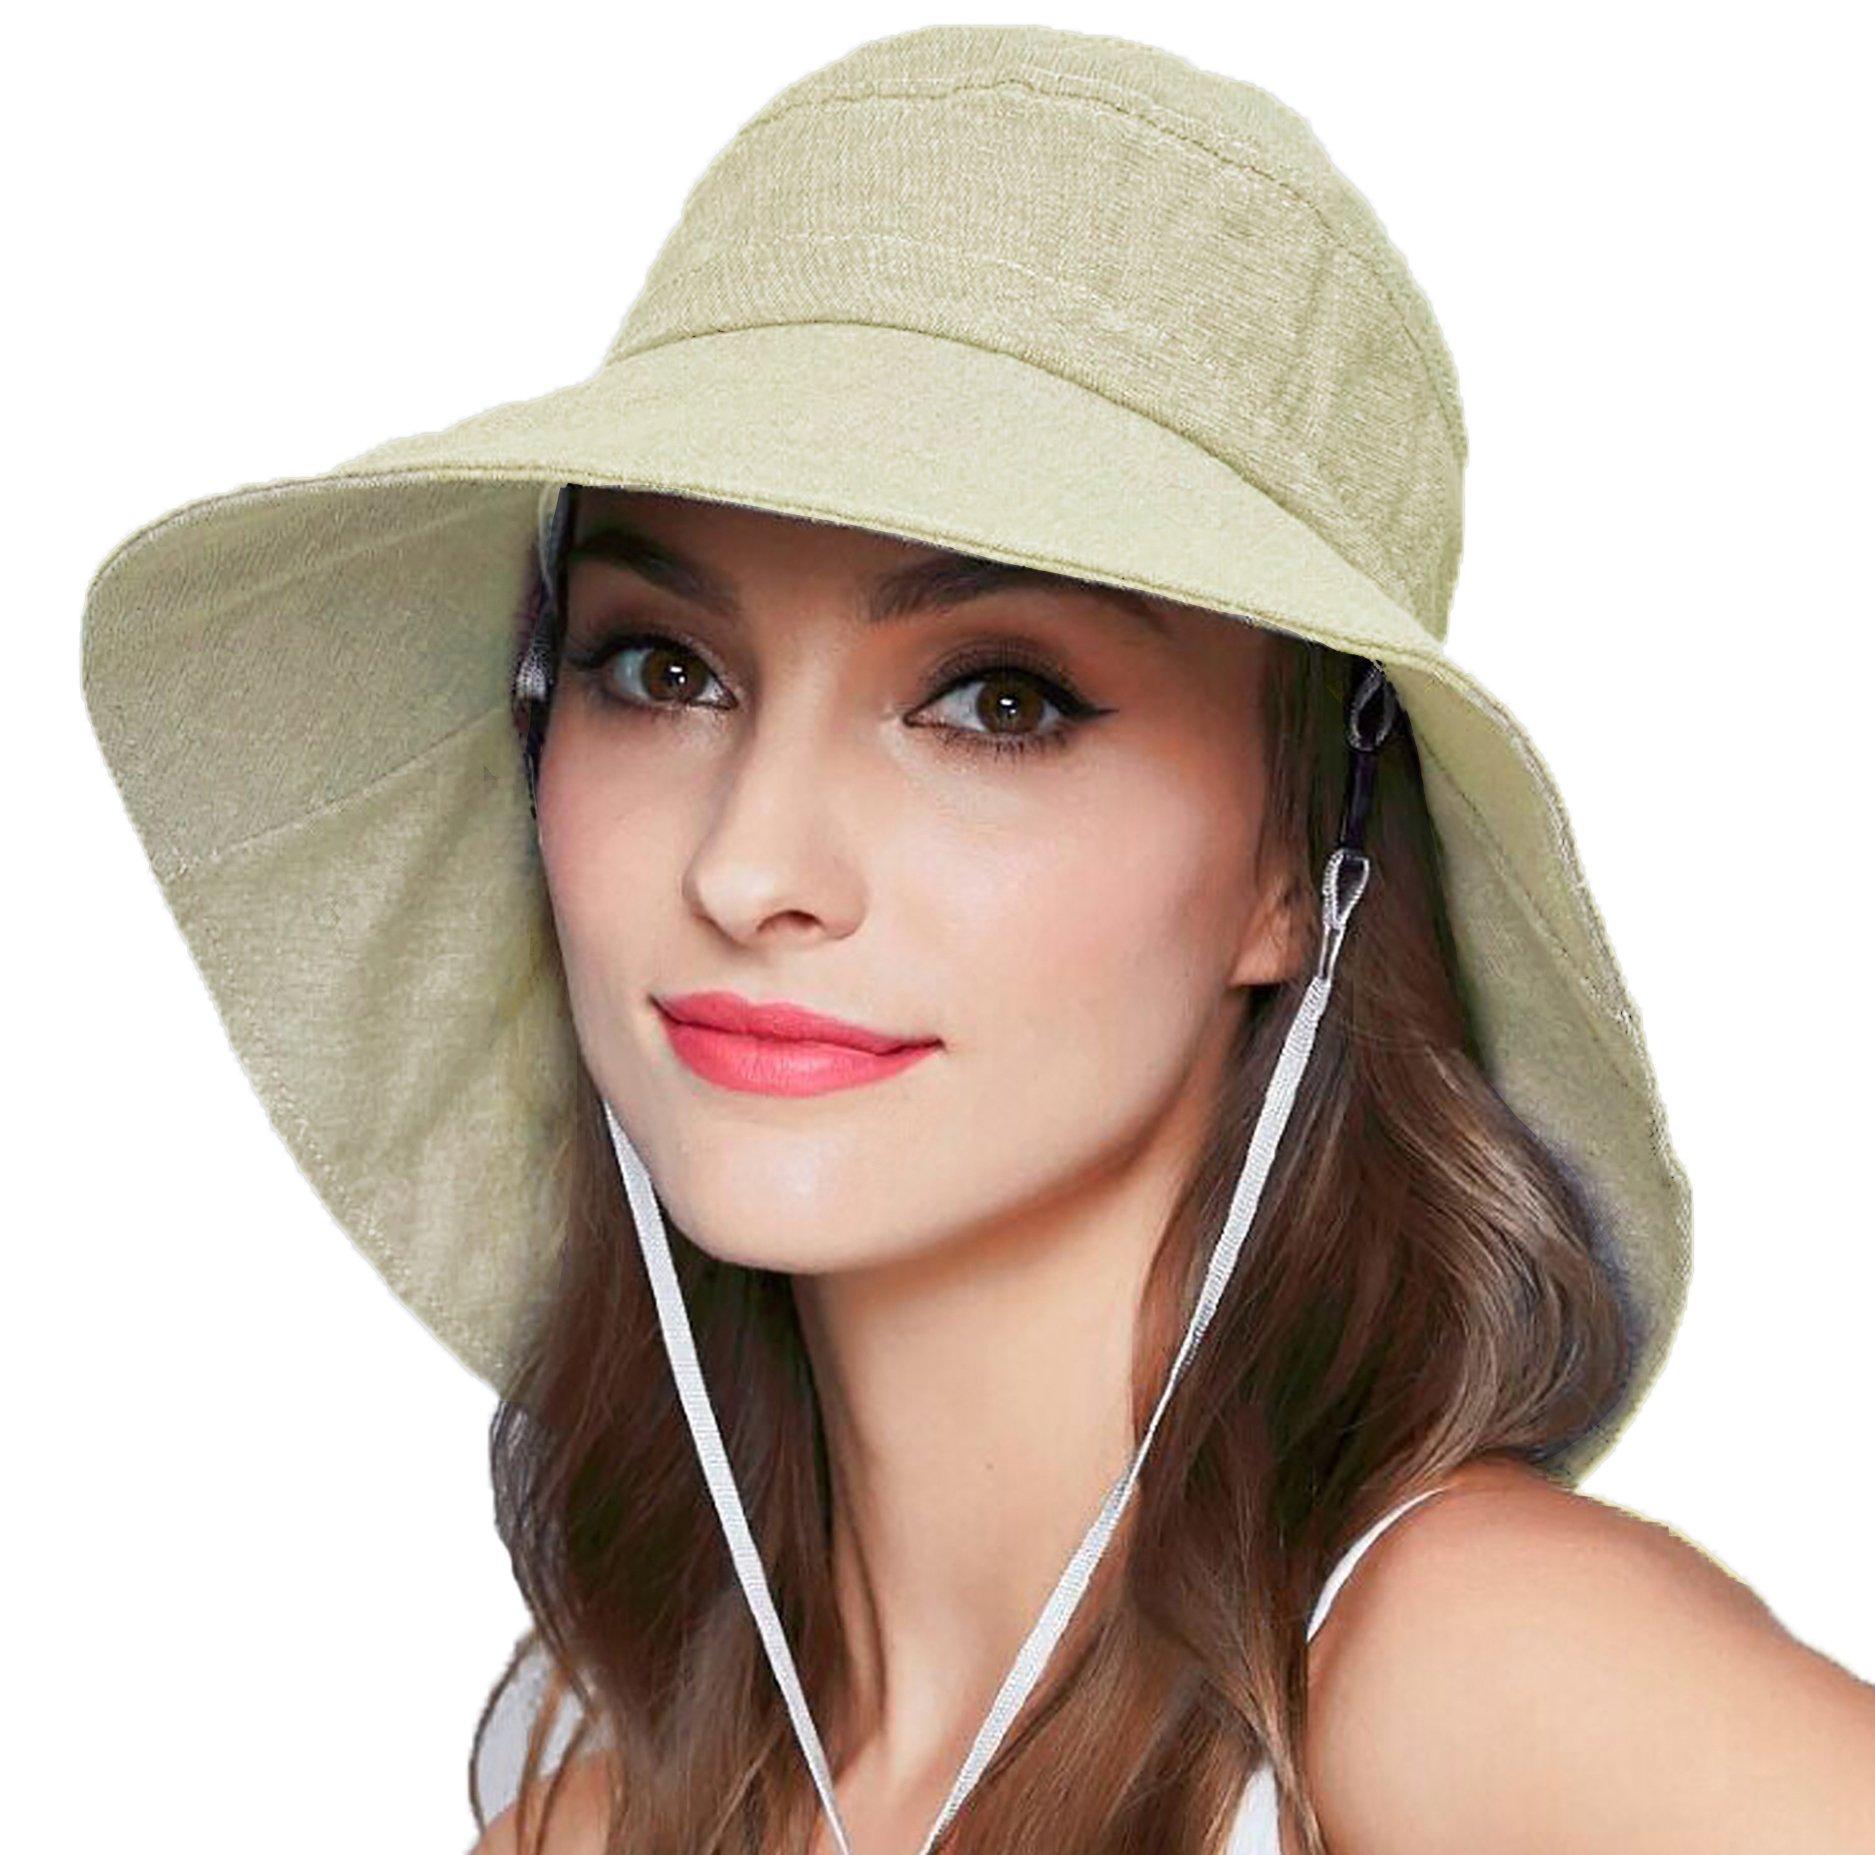 Women's Wide Brim Sun Hat, Sun Protection Bucket Boonie Cap for Beach Fishing Safari (Blue) (Beige)